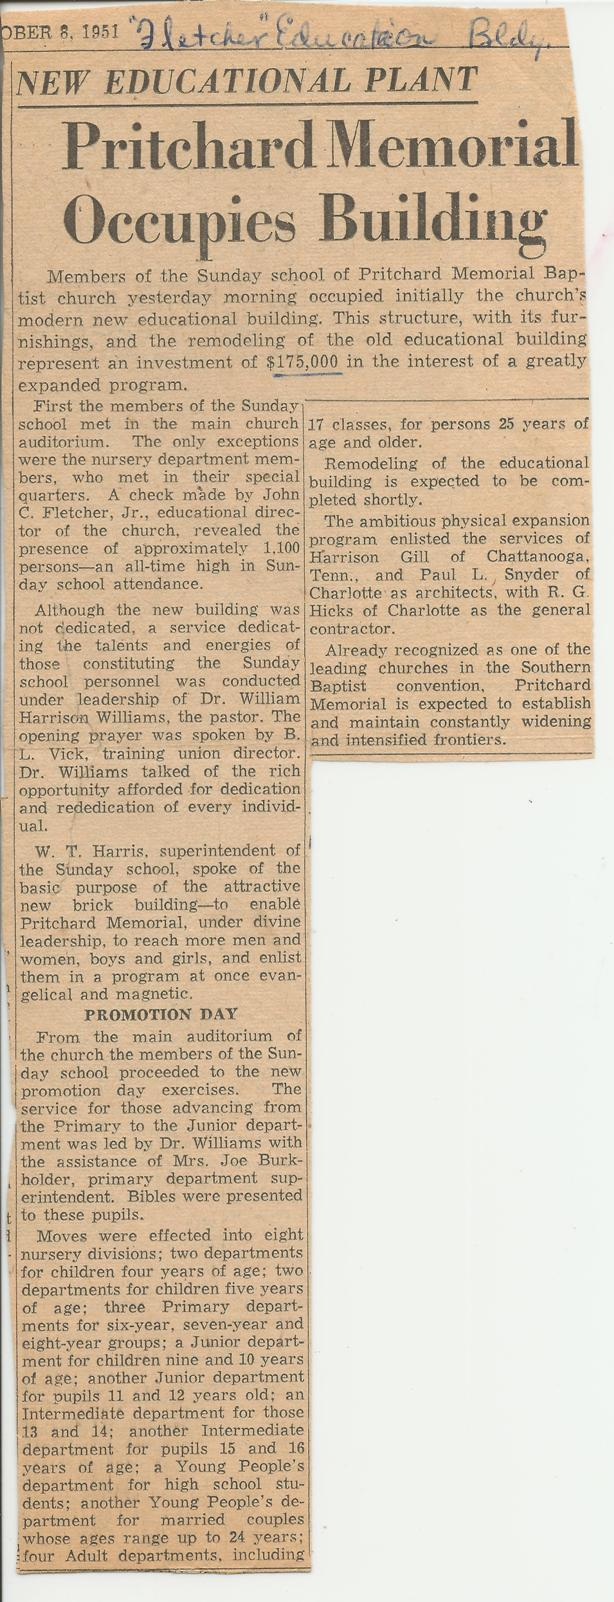 PMBC+10-8-1951+article+about+Fletcher+Bldg+opening.jpg